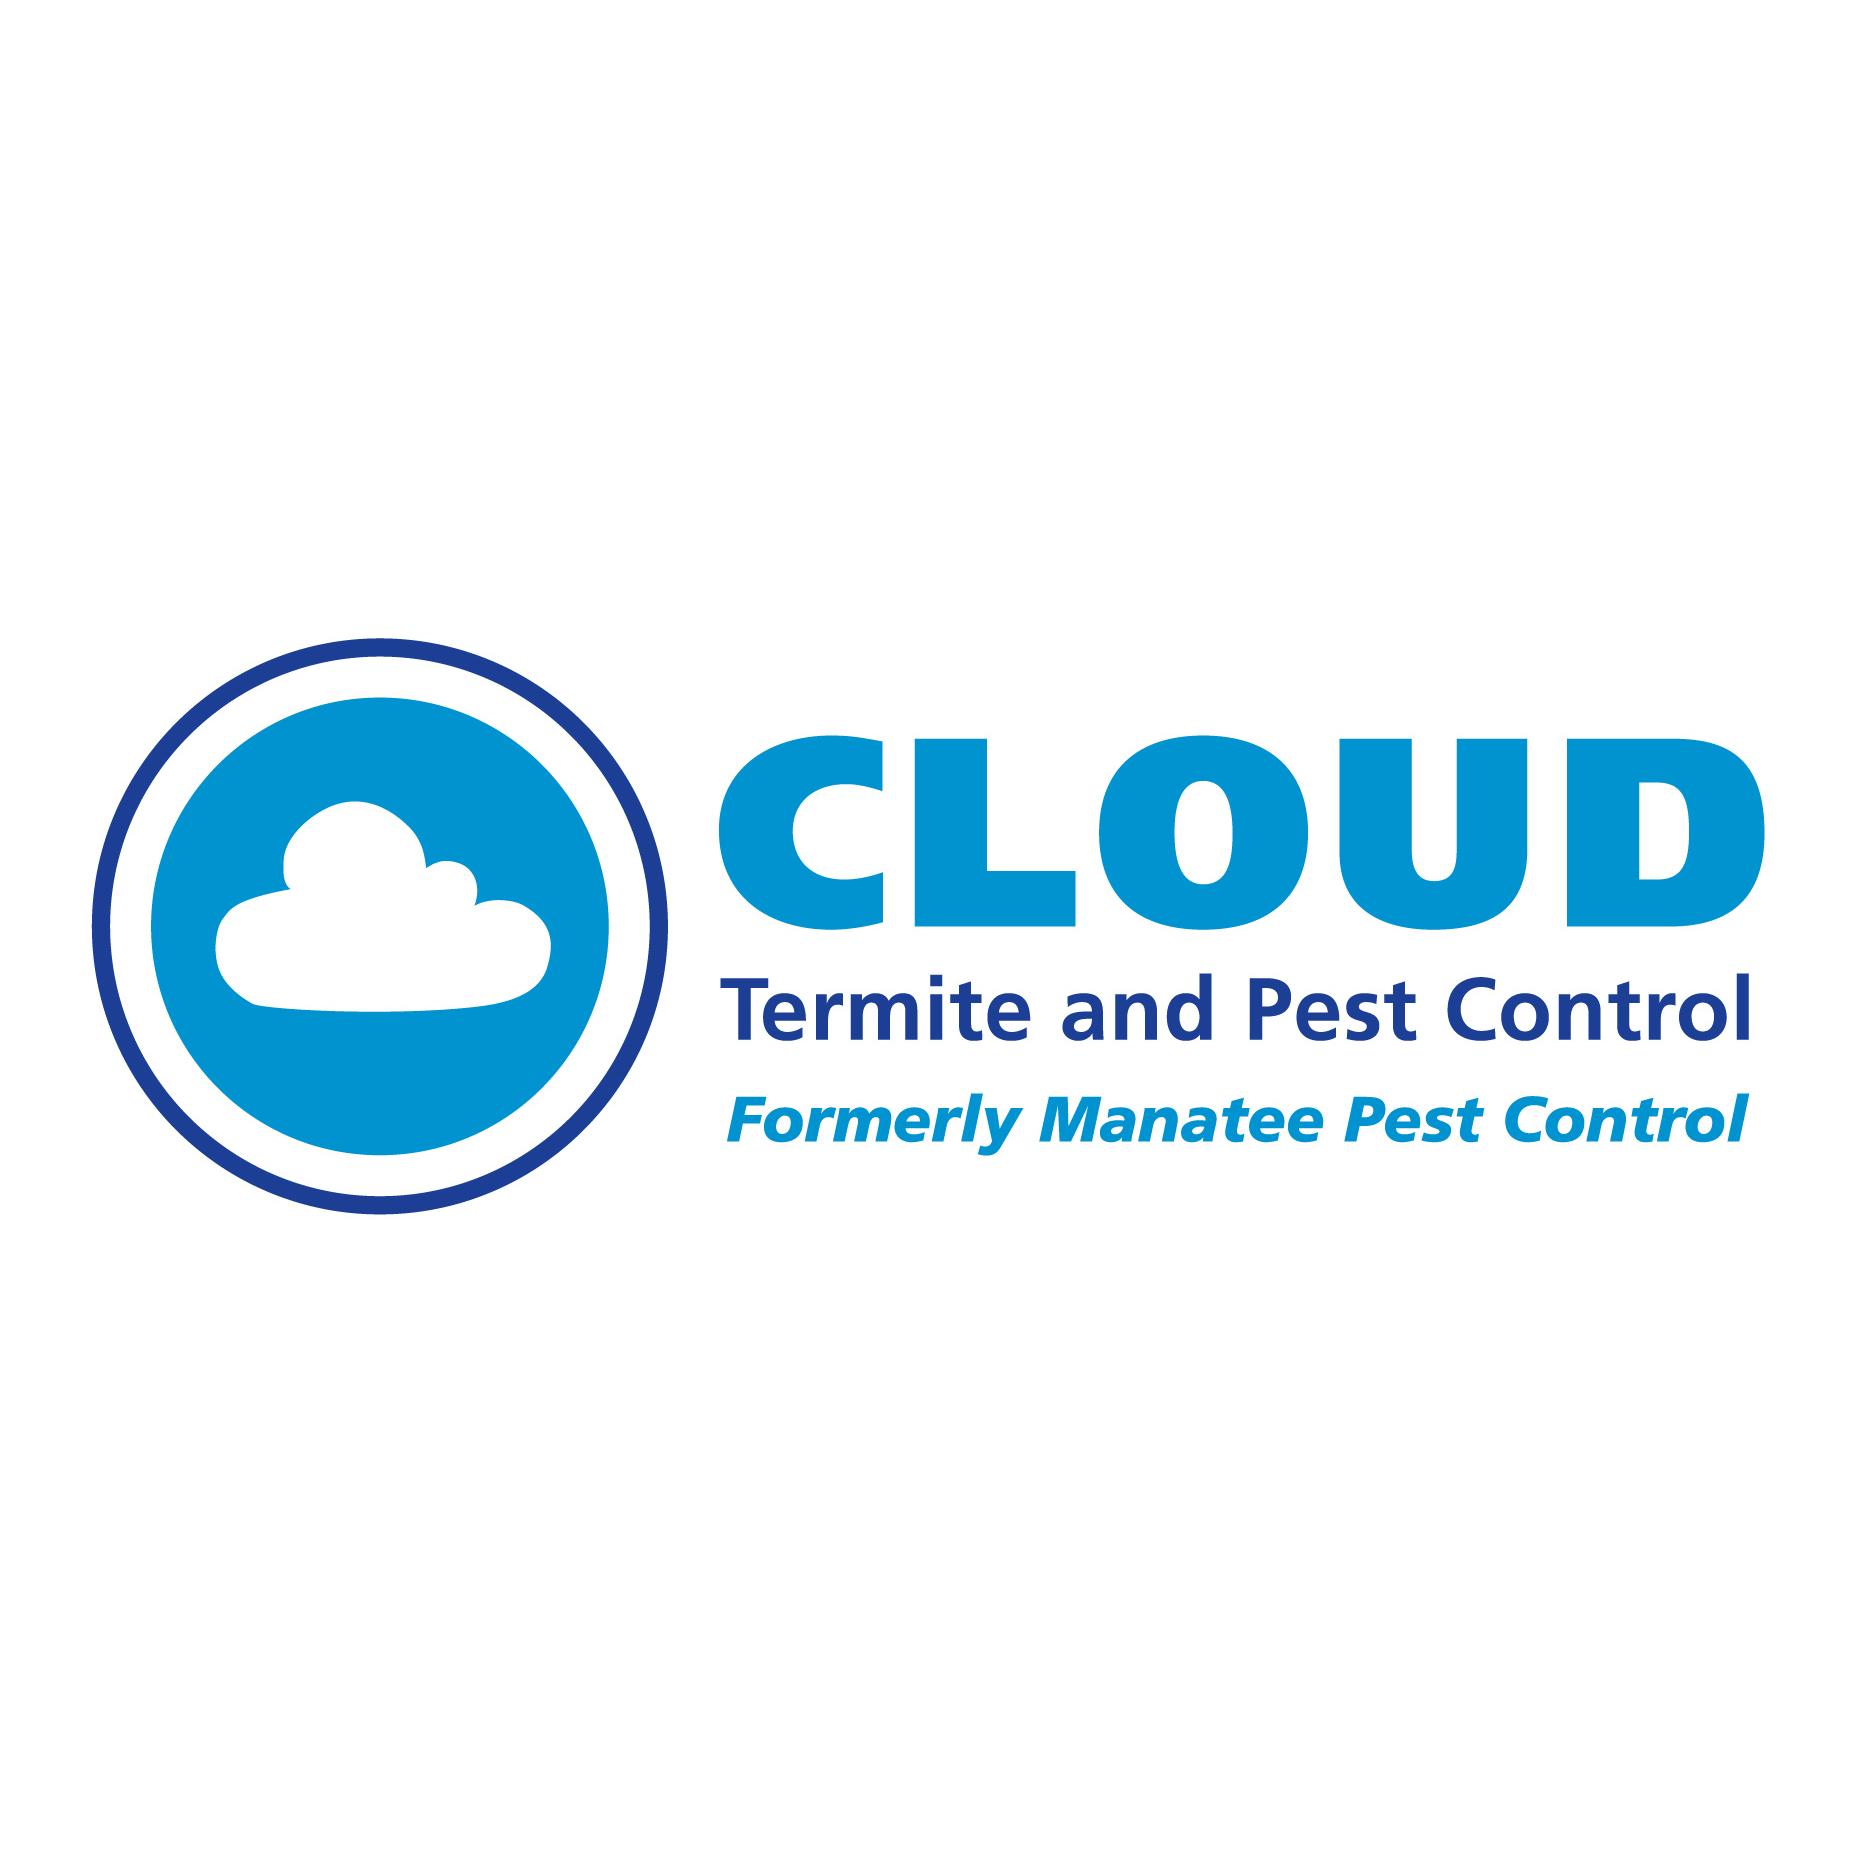 Cloud Termite and Pest Control